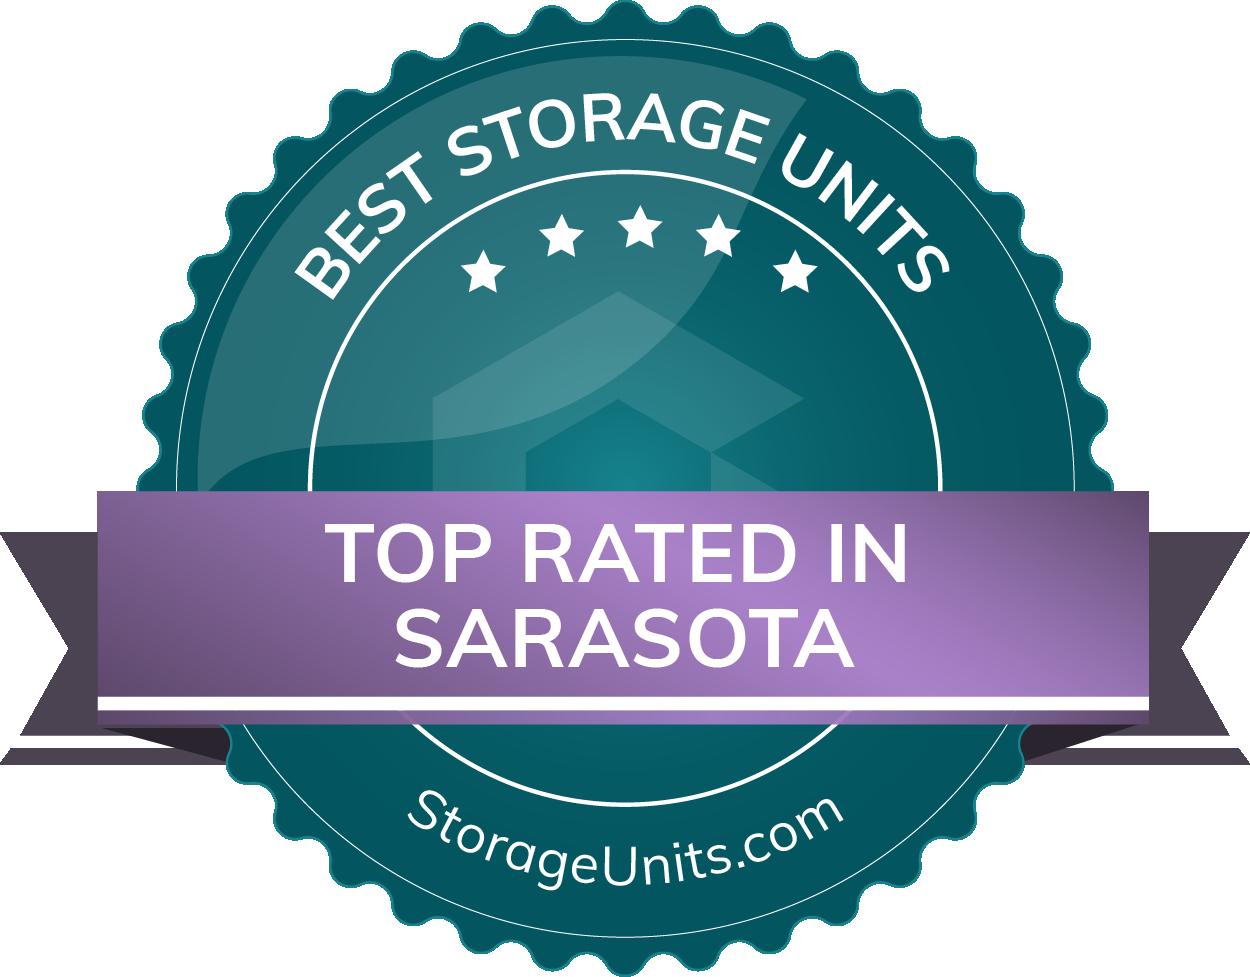 Best Self Storage Units in Sarasota, FL